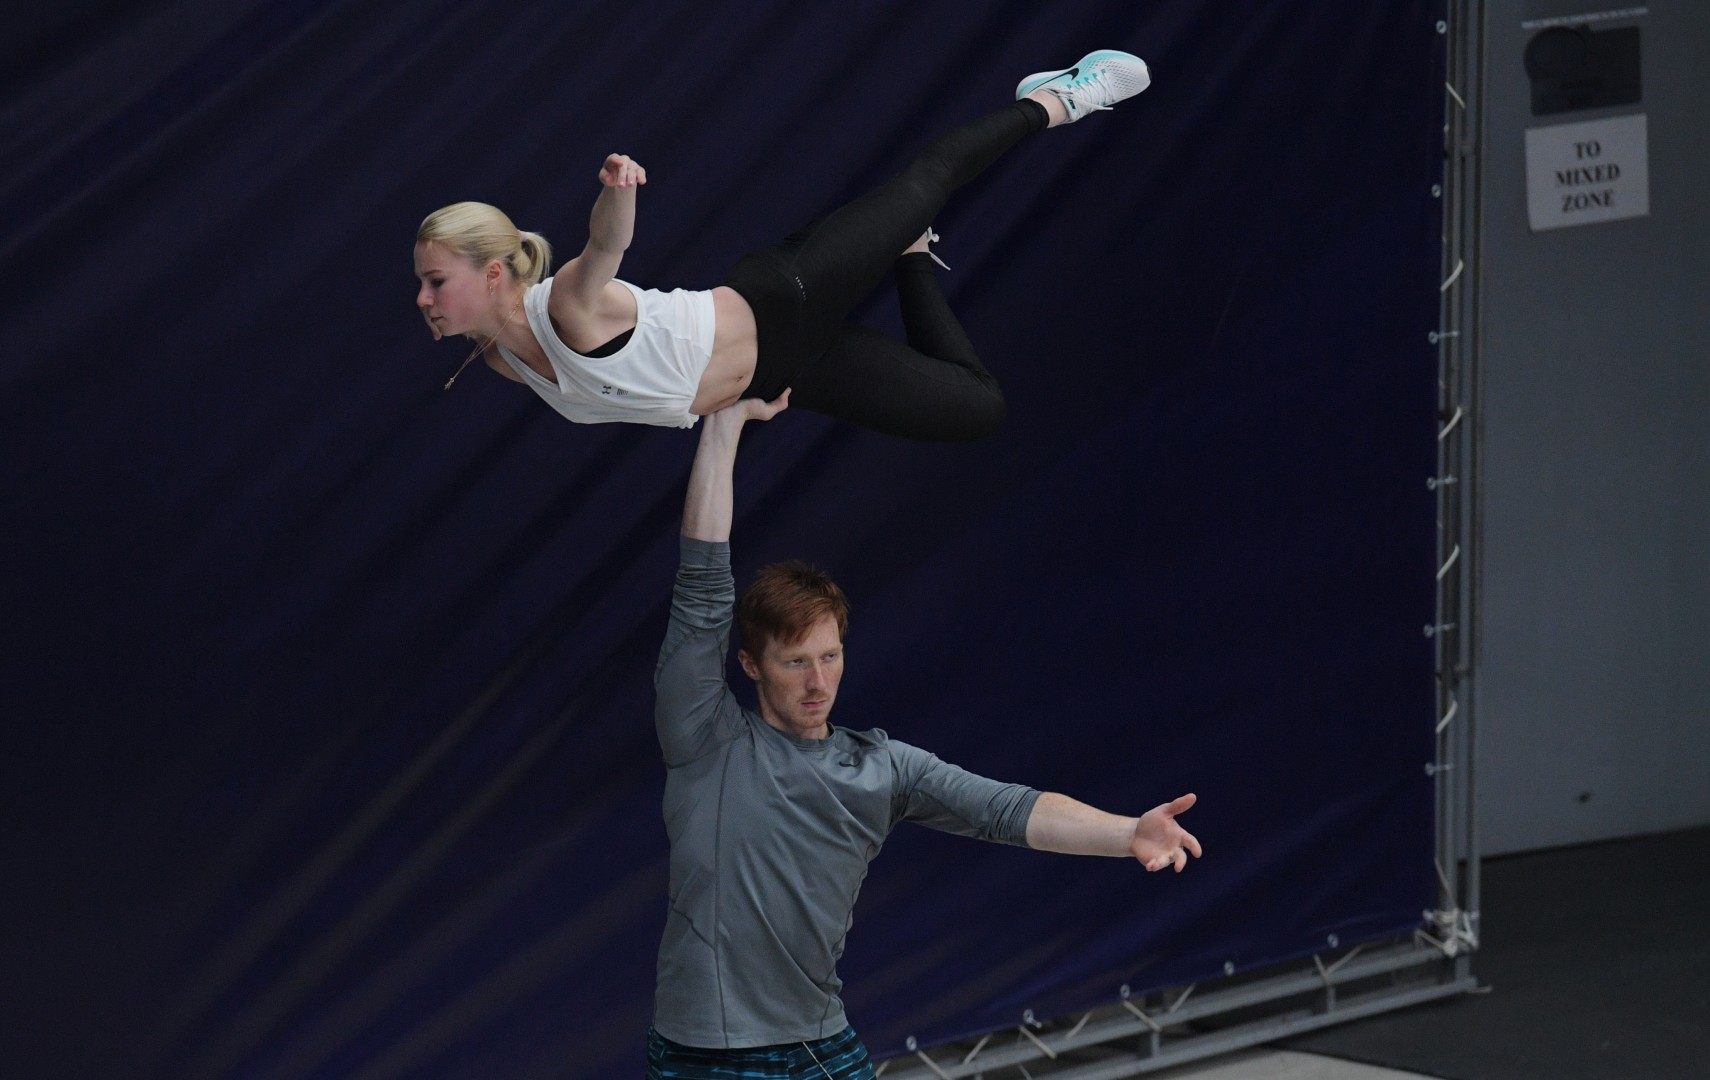 Евгения Тарасова - Владимир Морозов-2 - Страница 14 F8yHIGUqZUA